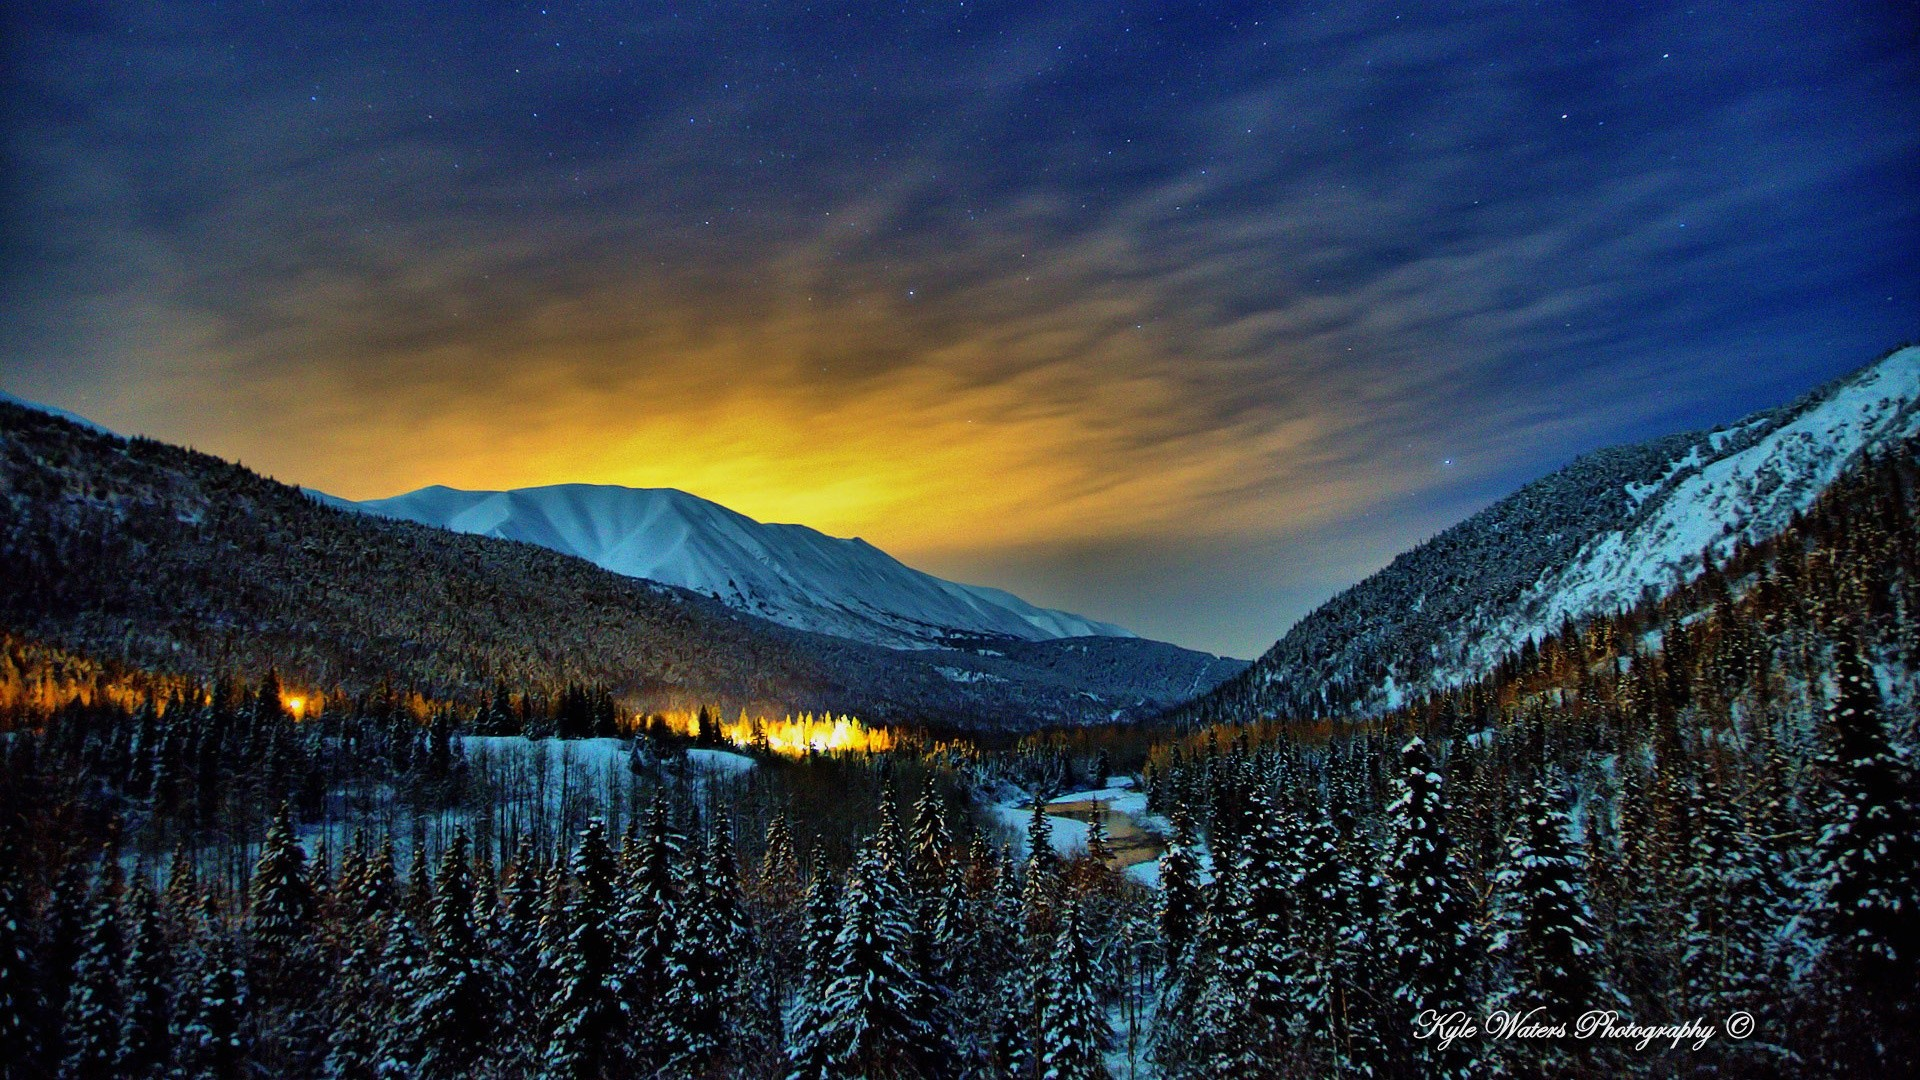 Alaska Winter Nights Wallpapers   HD Wallpapers